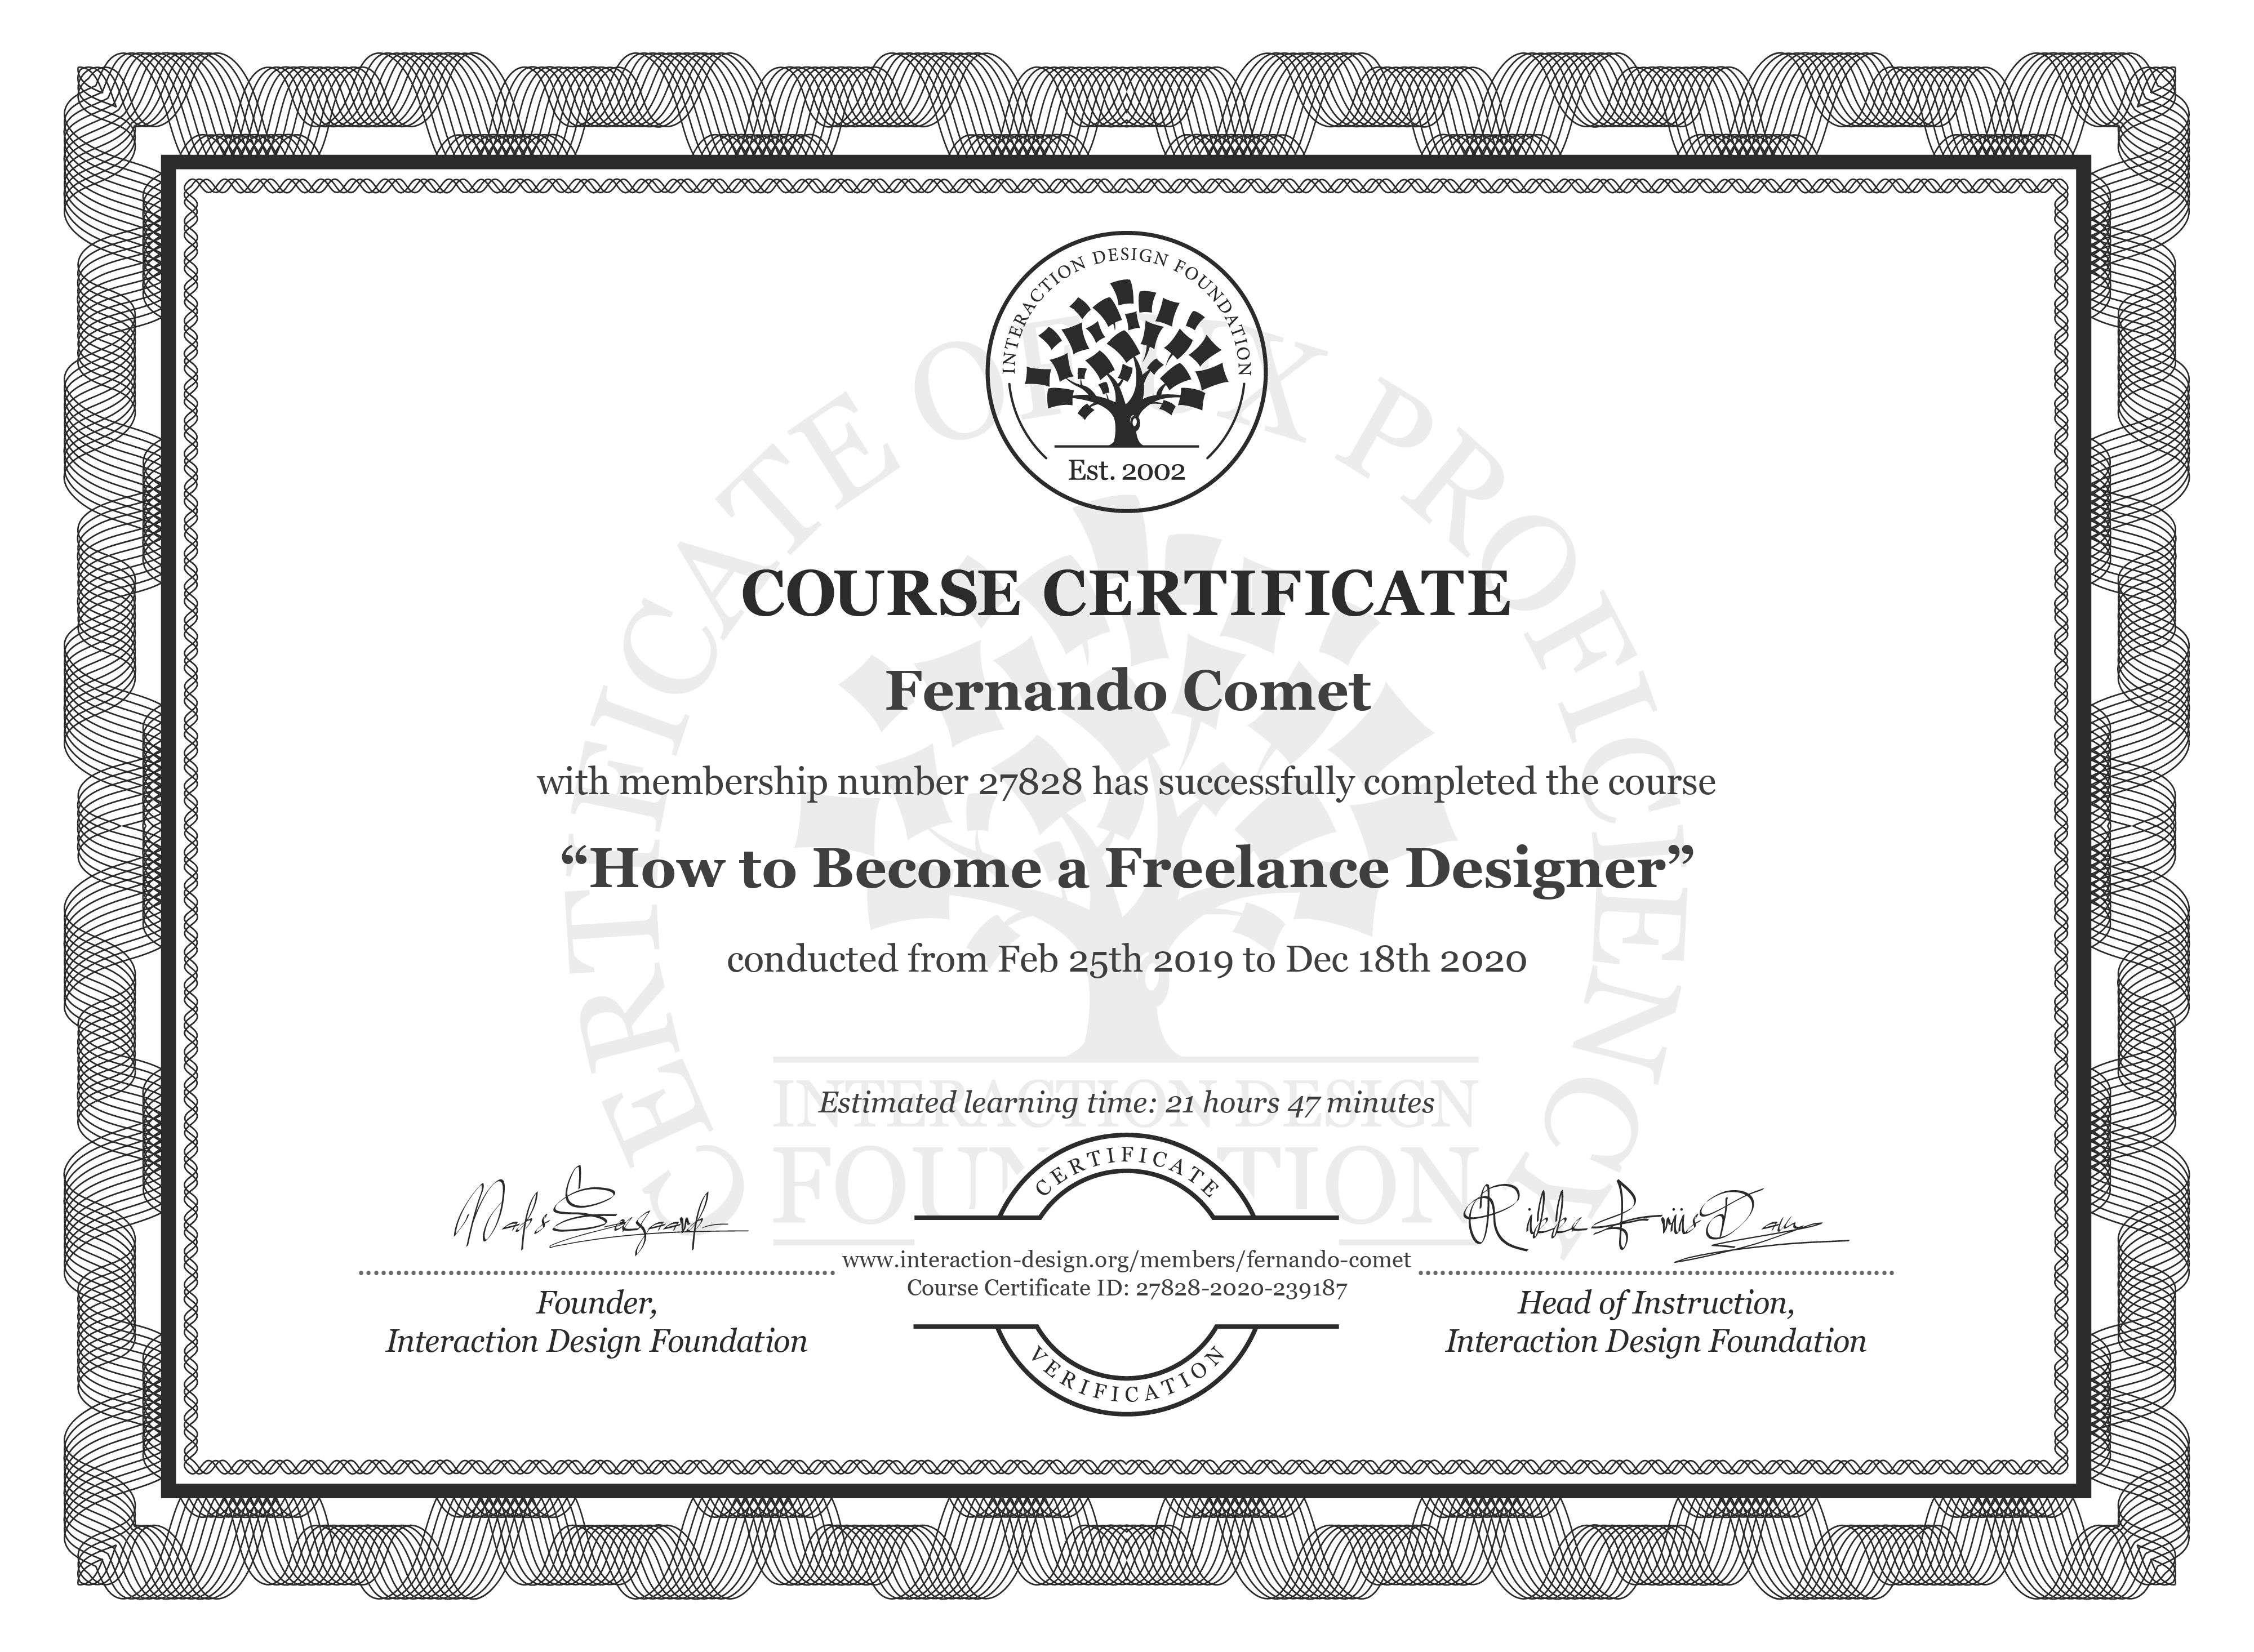 Fernando Comet's Course Certificate: How to Become a Freelance Designer